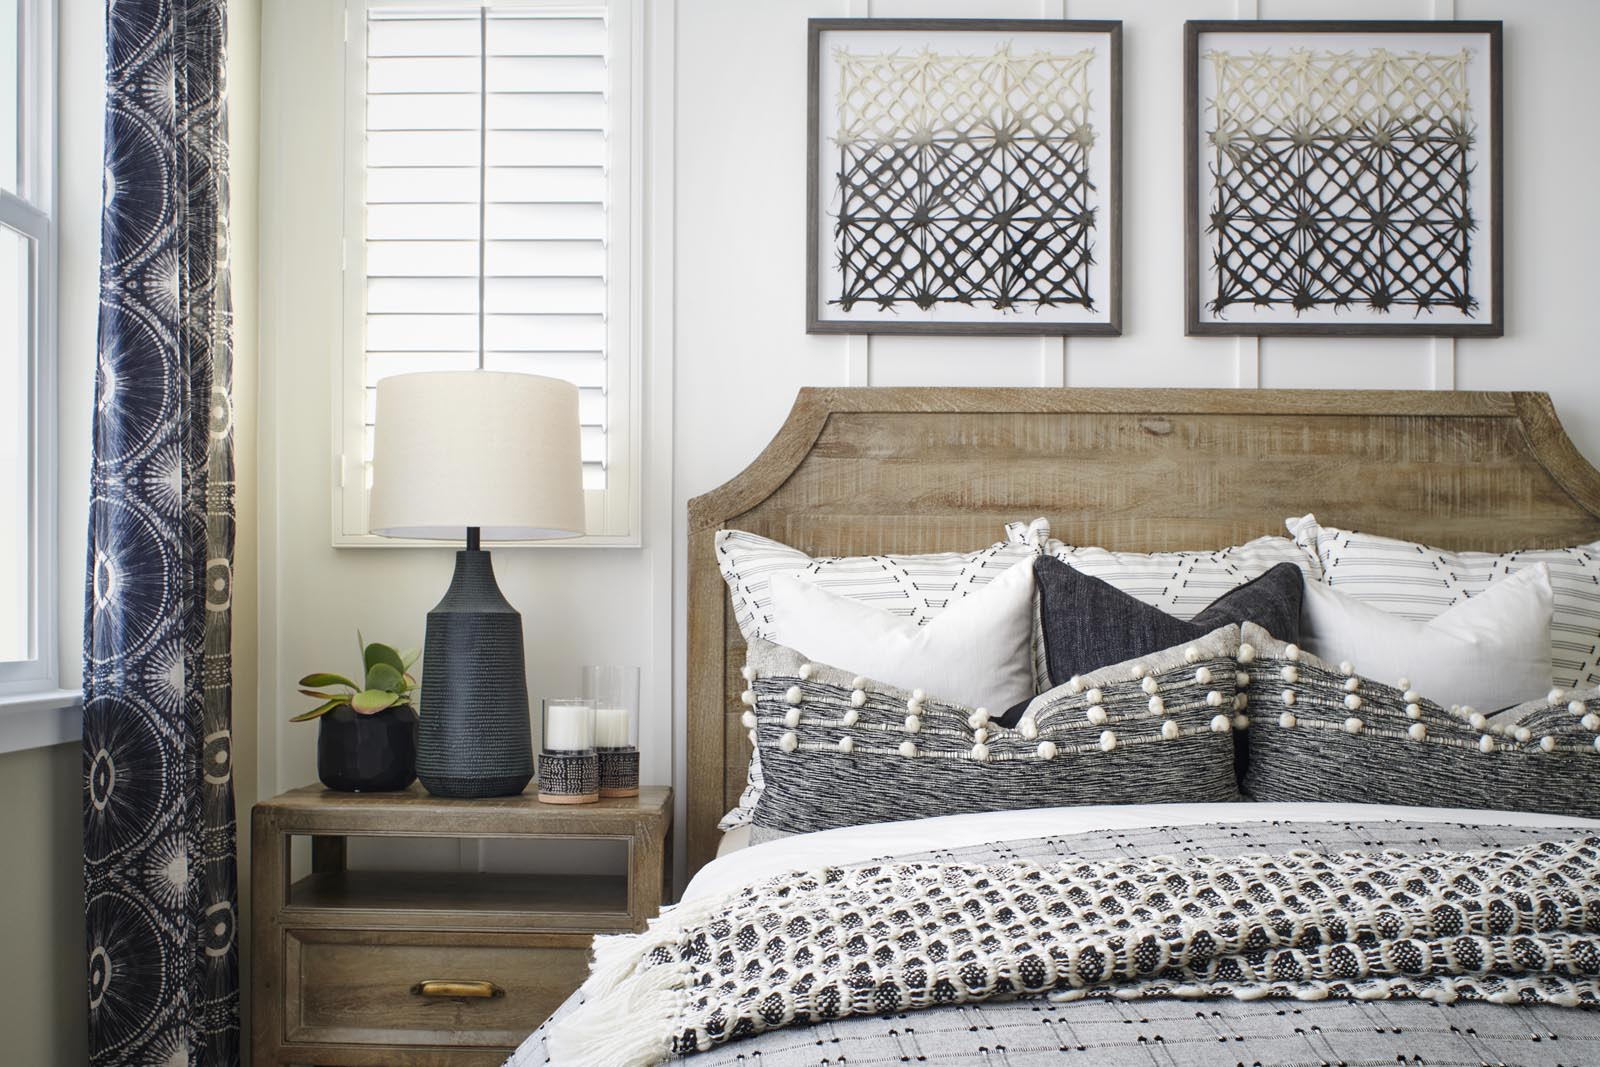 Master Bedroom   Residence 2   Enliven   New Homes in Rancho Cucamonga, CA   Van Daele Homes